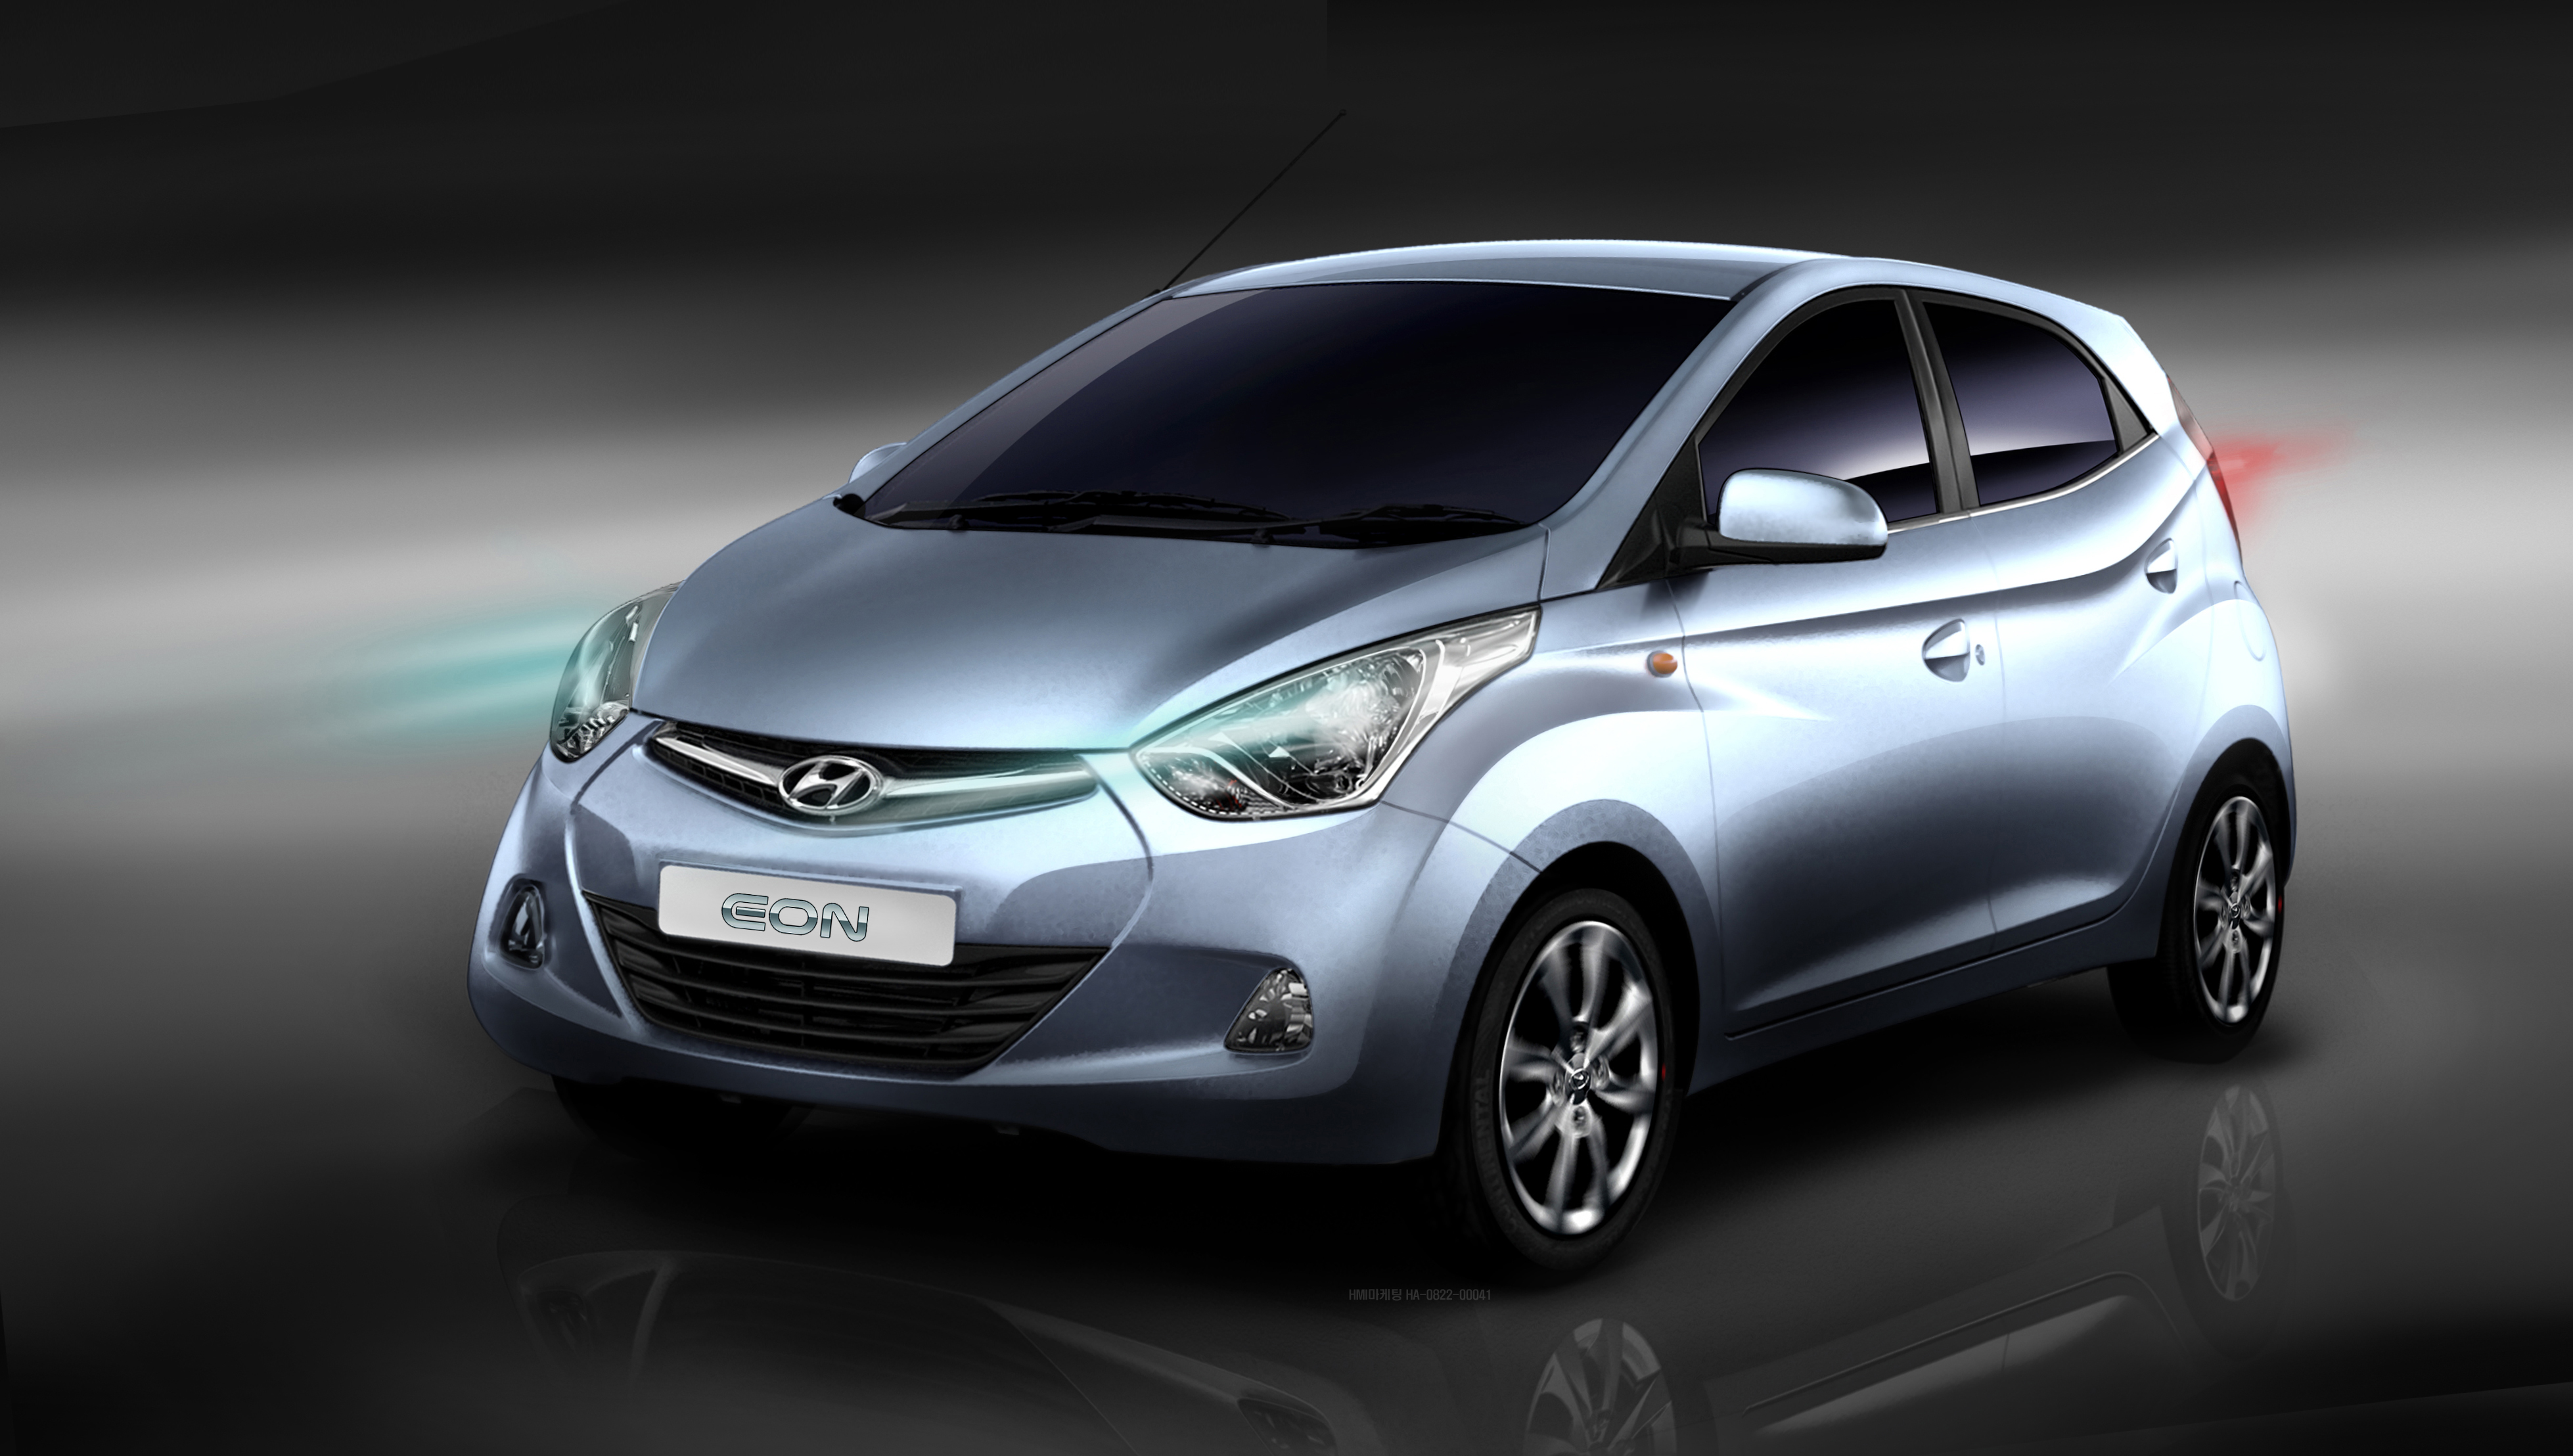 Hyundai Eon Hyundai Motor Company